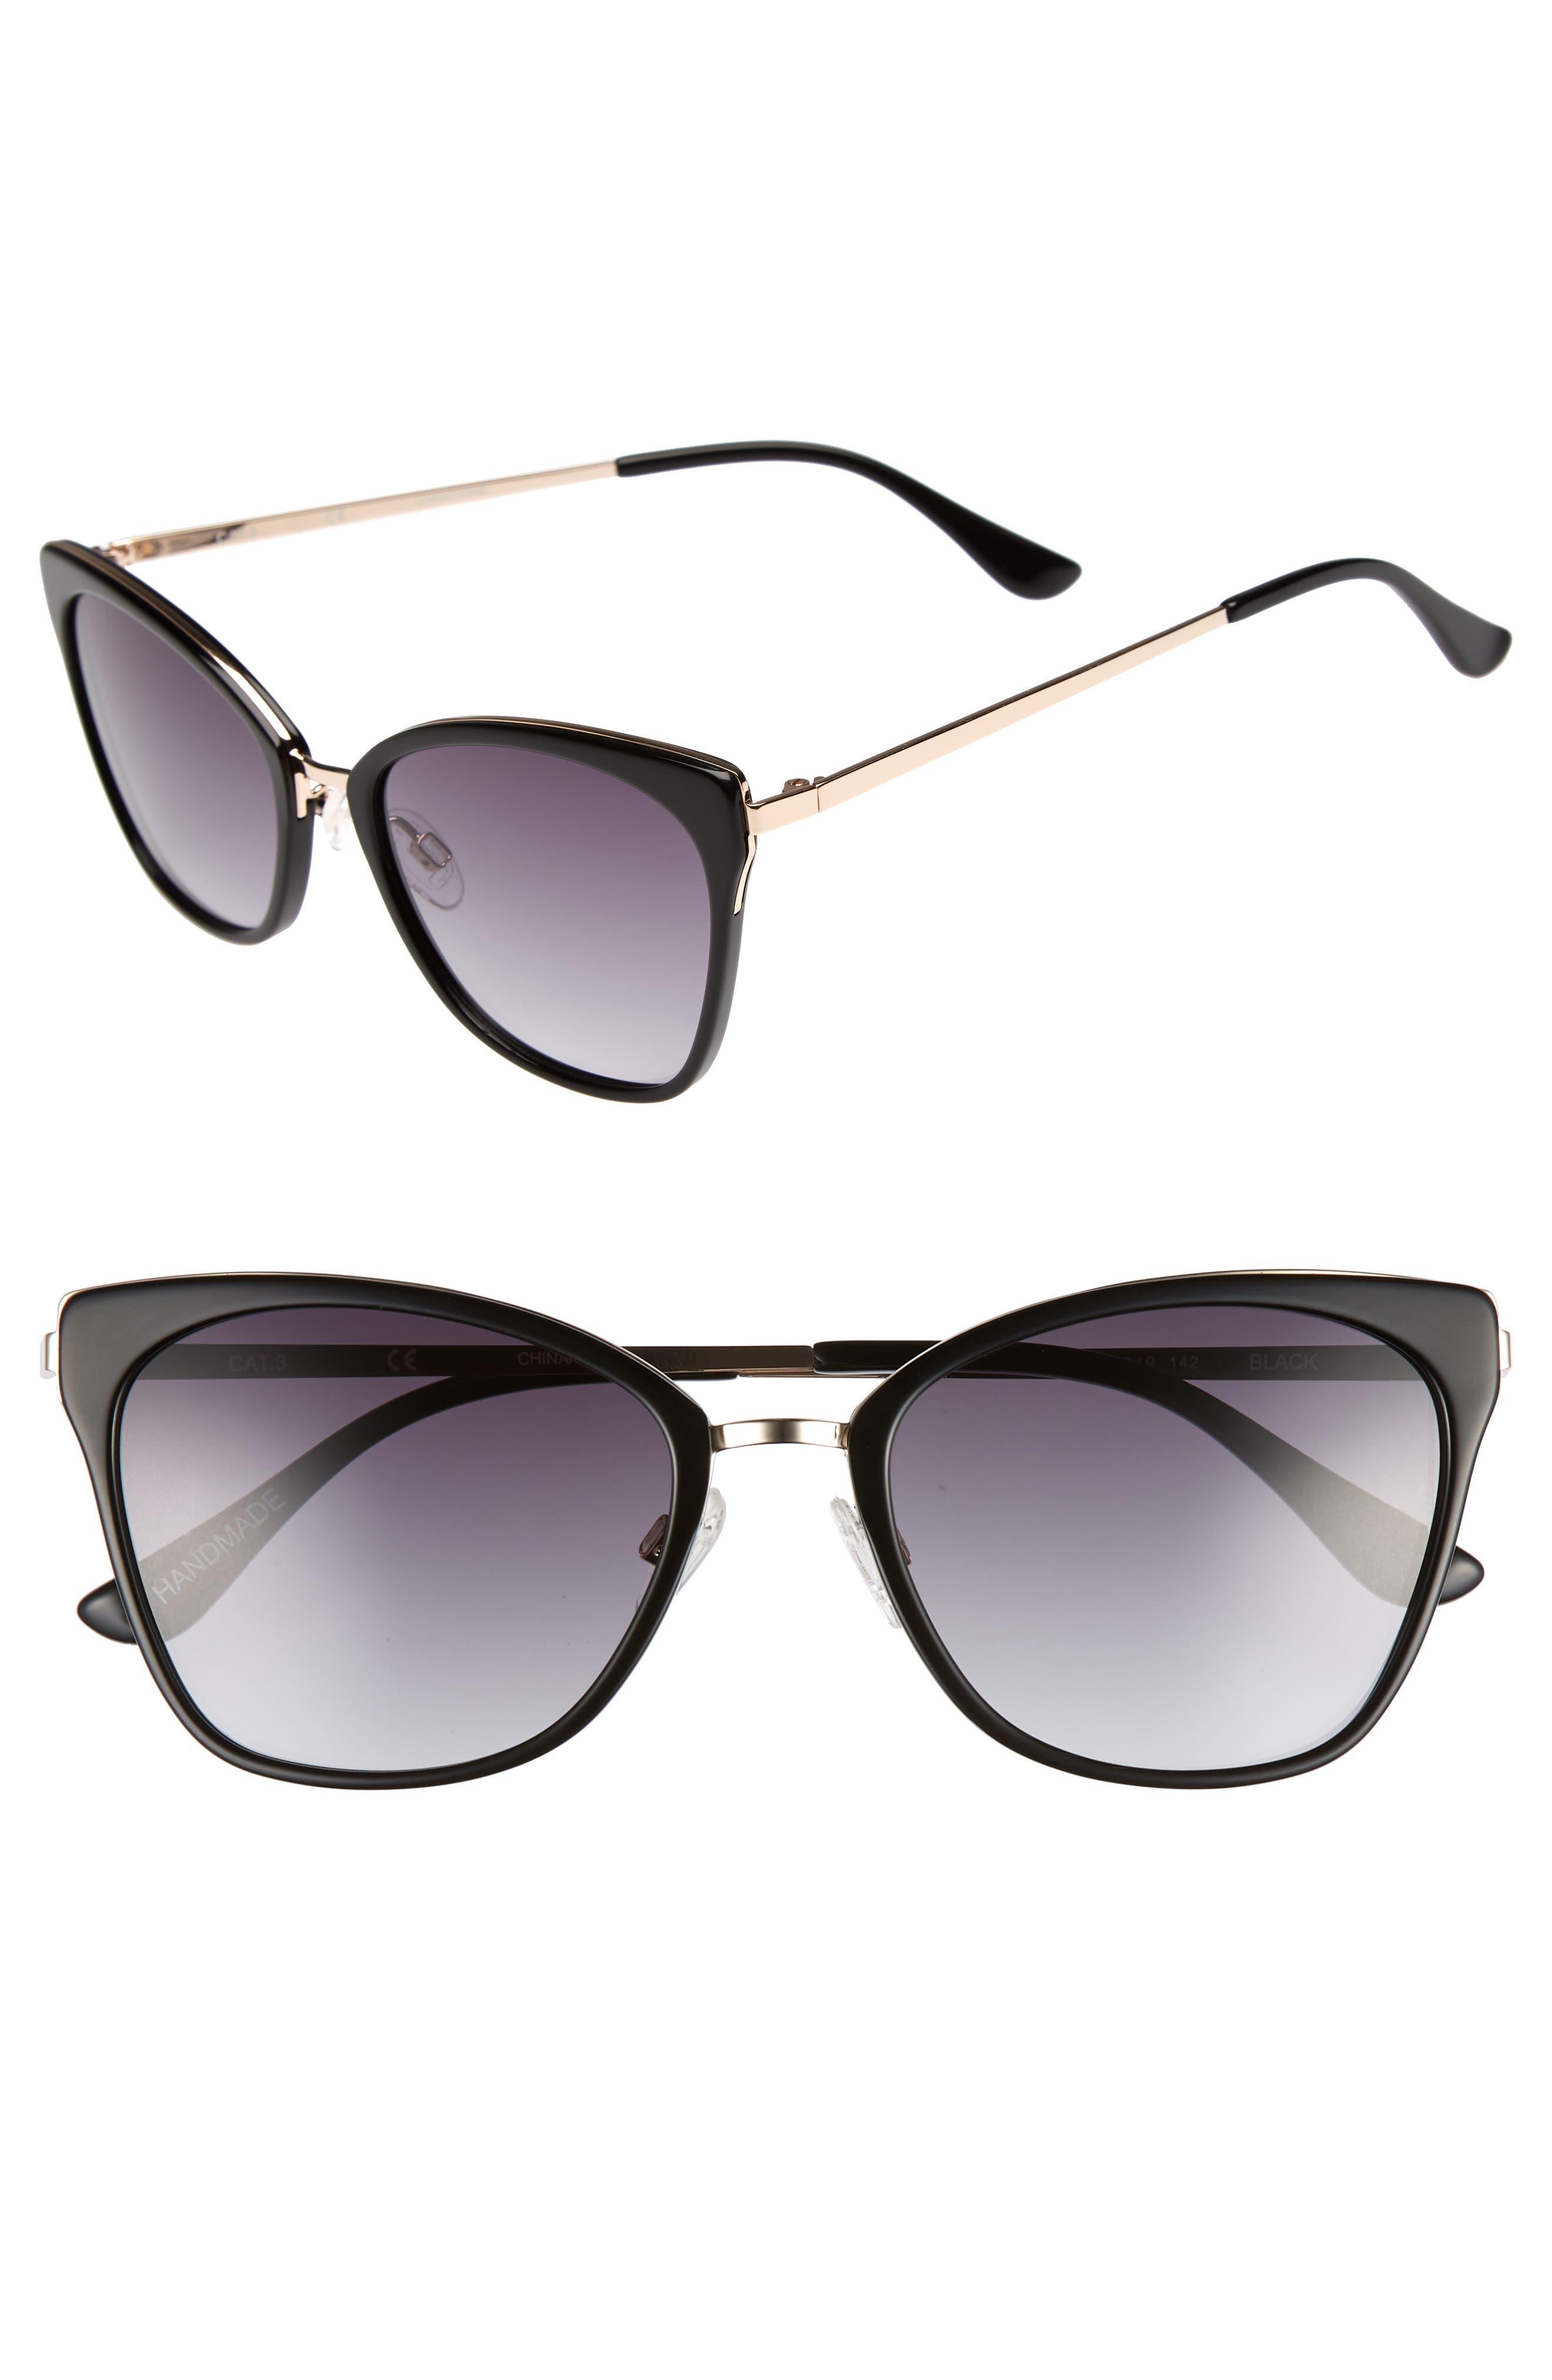 Origami 55mm Cat Eye Sunglasses,                         Main,                         color, Black